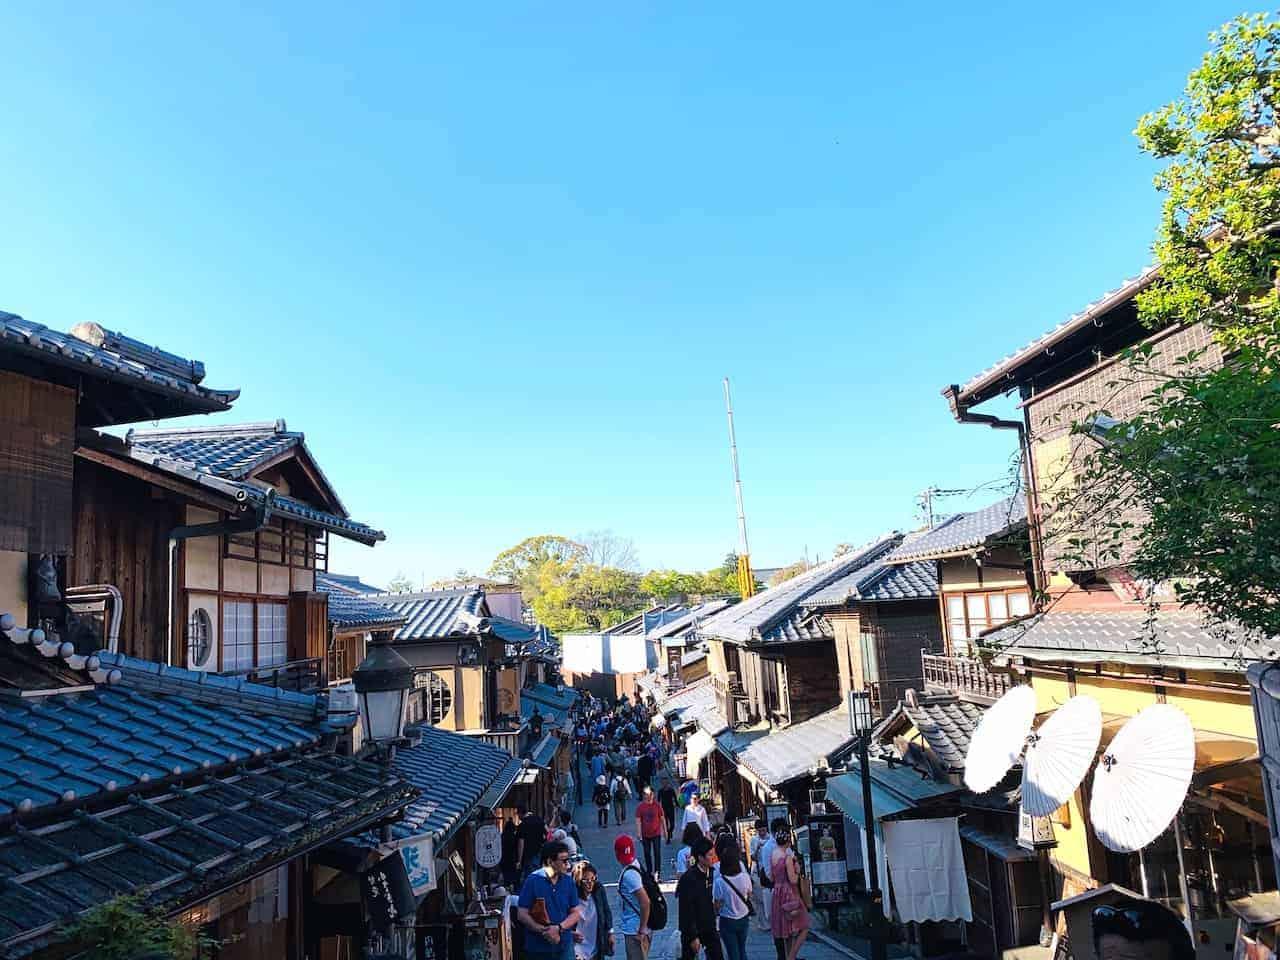 Ninenzakka Sannenzaka Kyoto